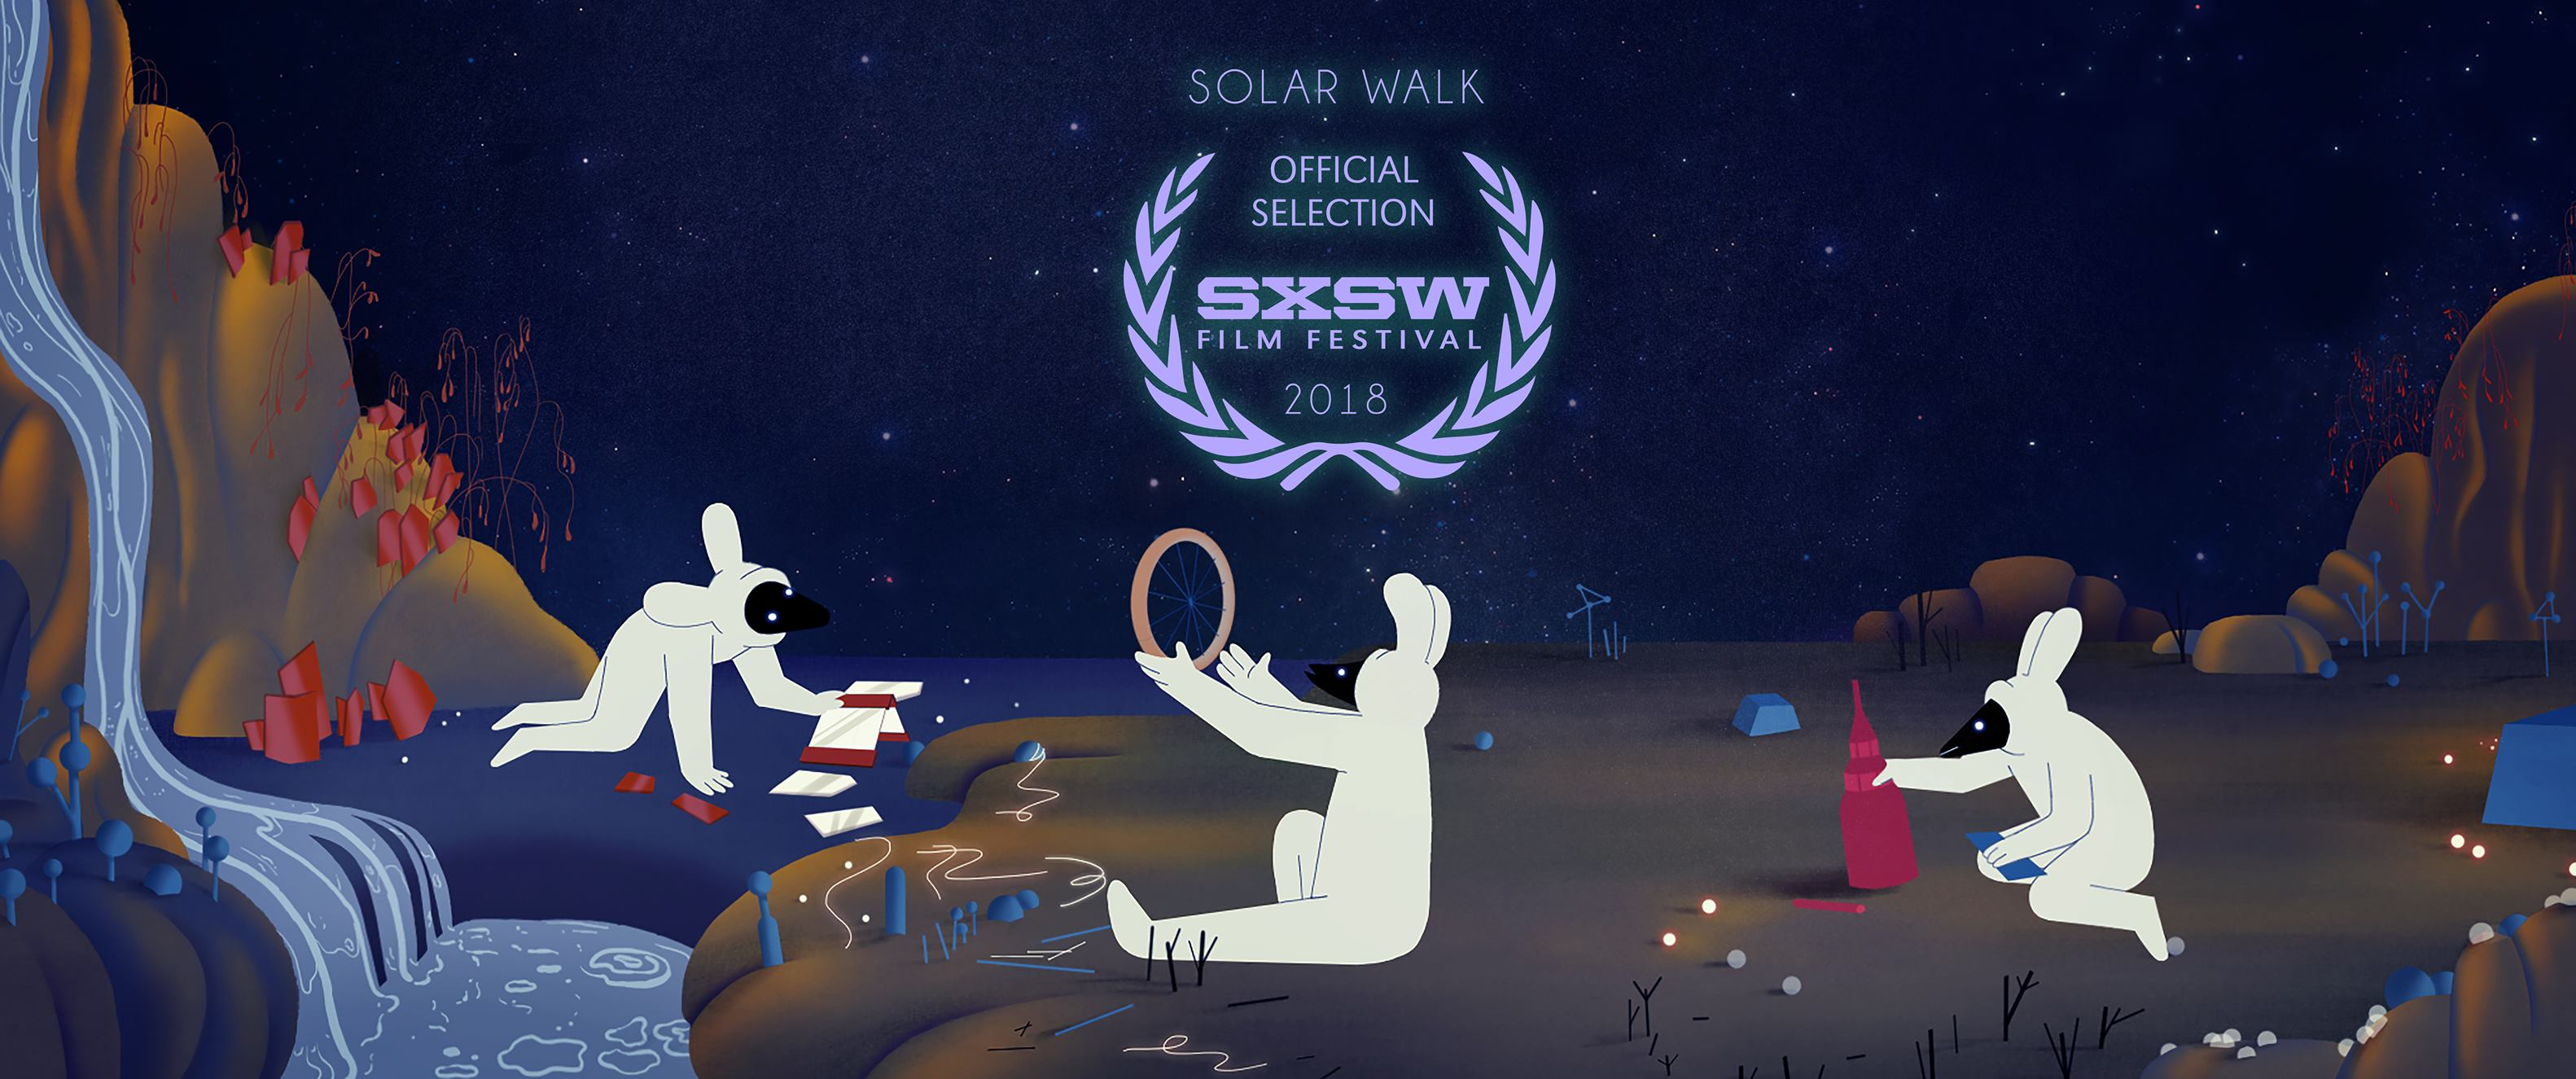 solar_walk_x_sxsw.jpg